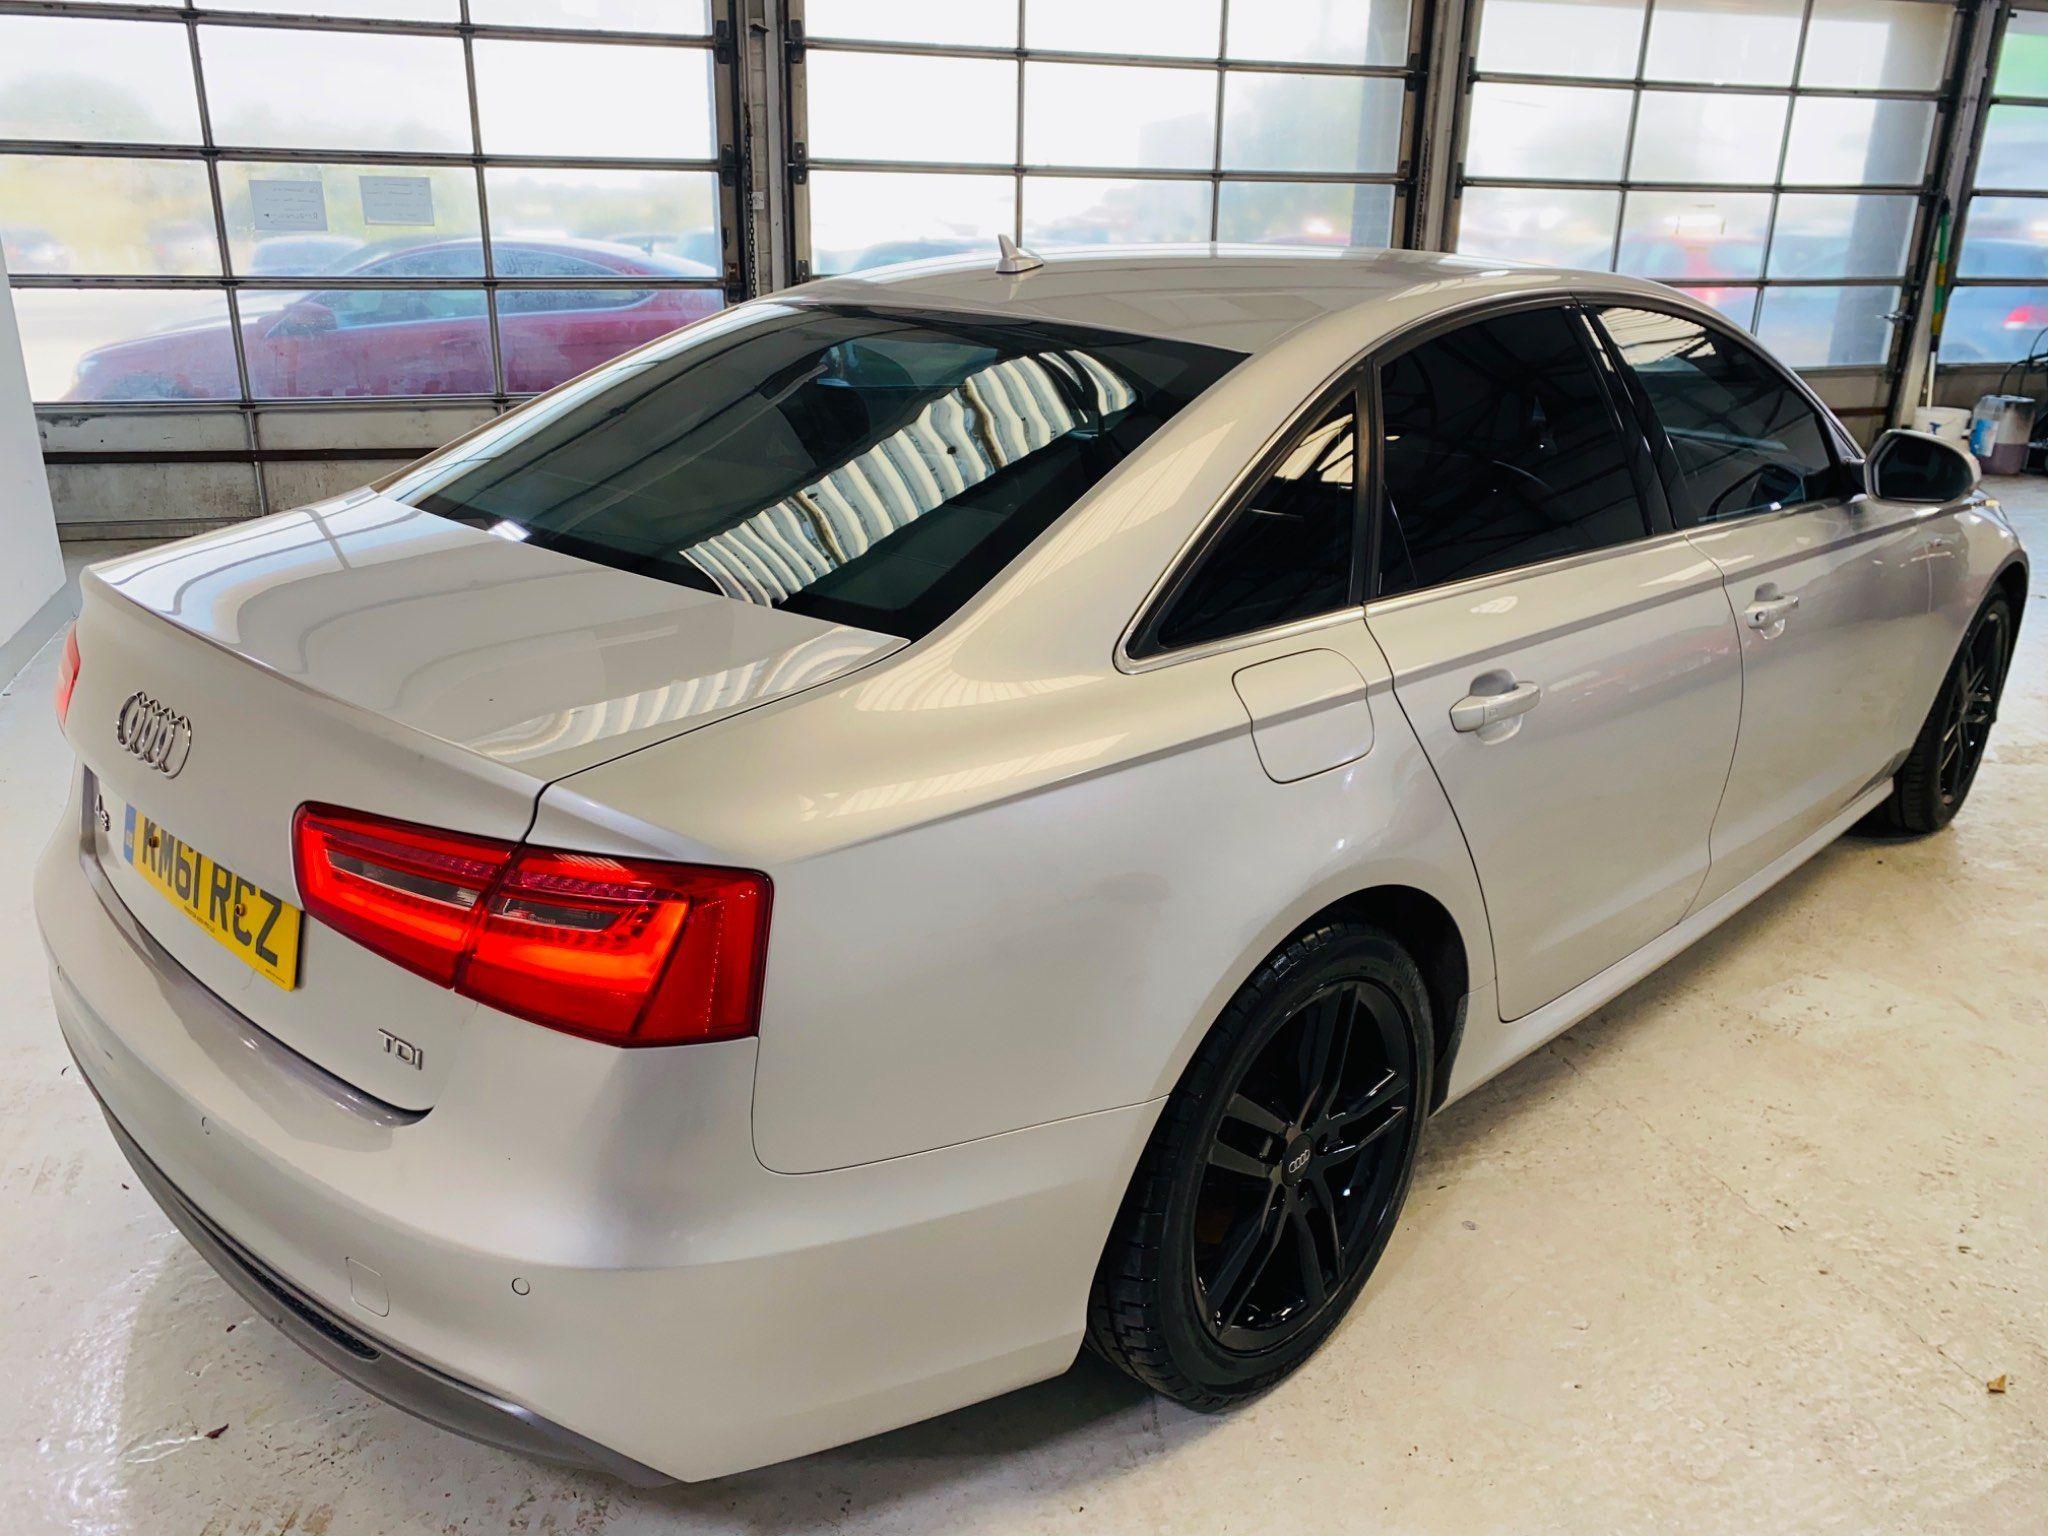 Audi A6 Saloon 2.0 TDI S line 4dr full